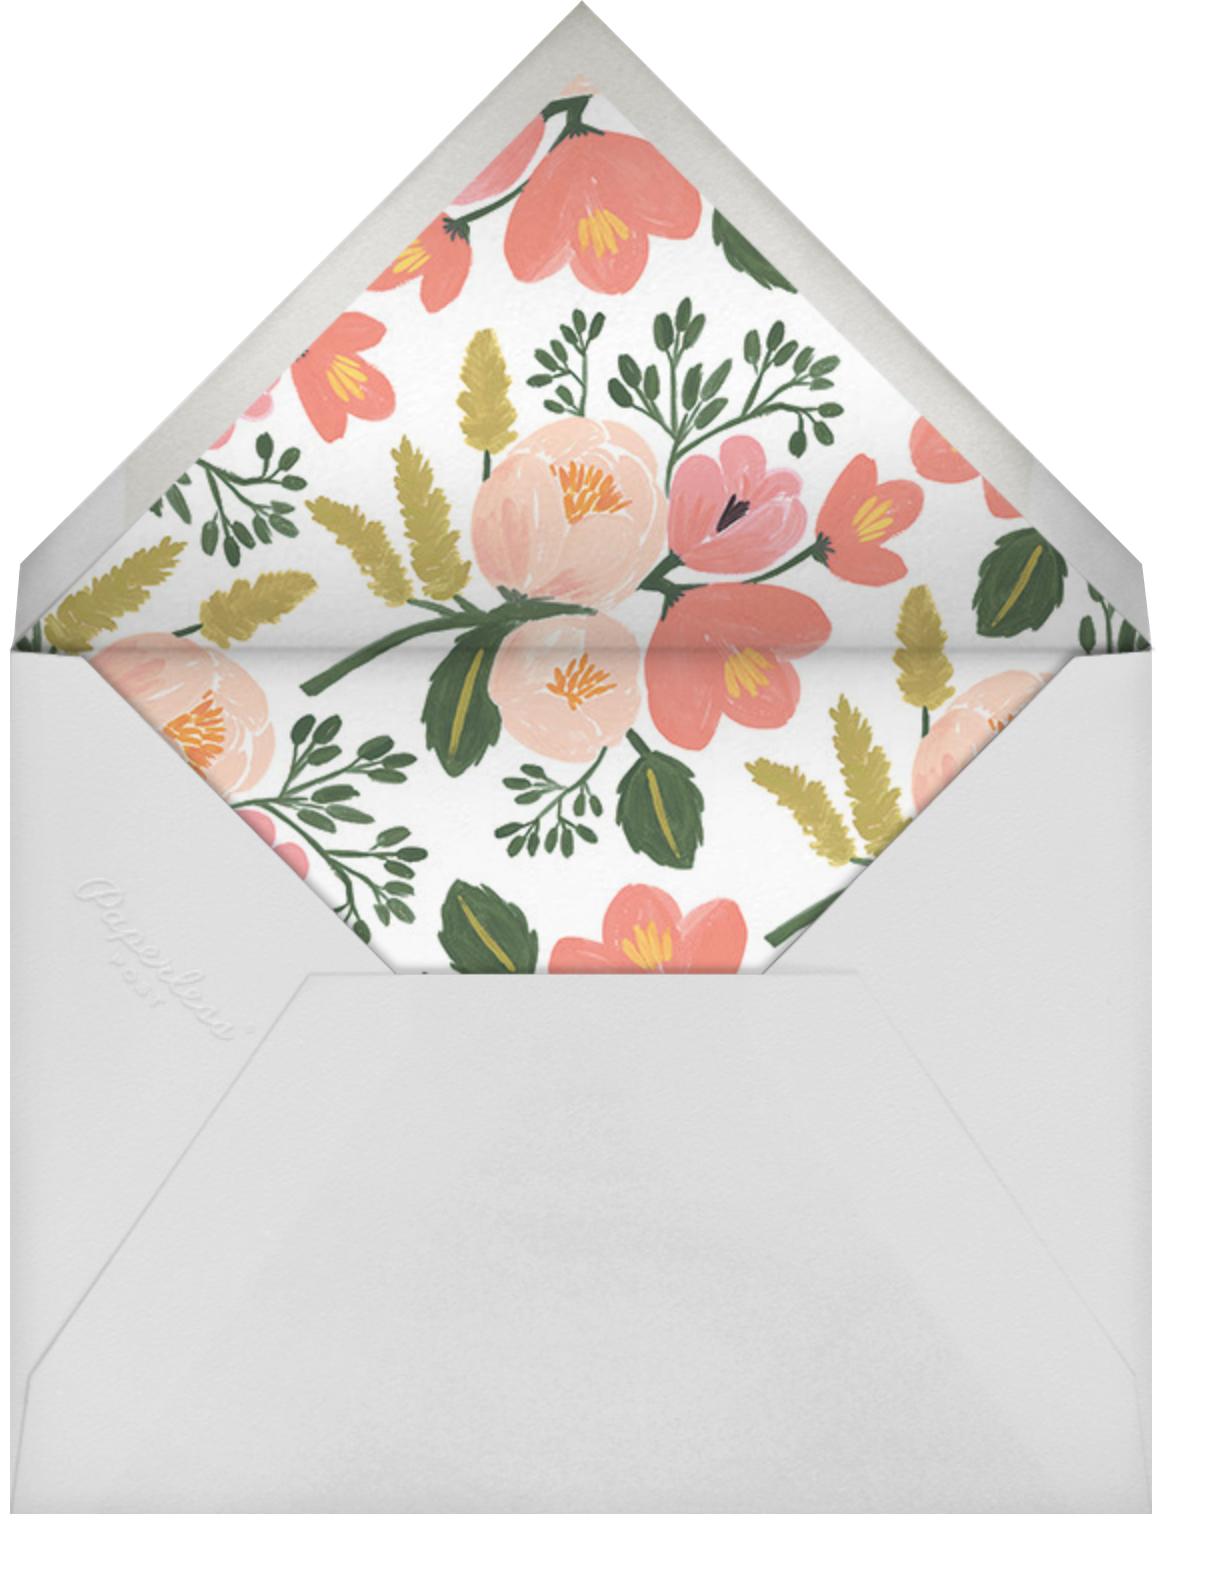 Botanic Year (Tall) - Black  - Rifle Paper Co. - New Year's Eve - envelope back